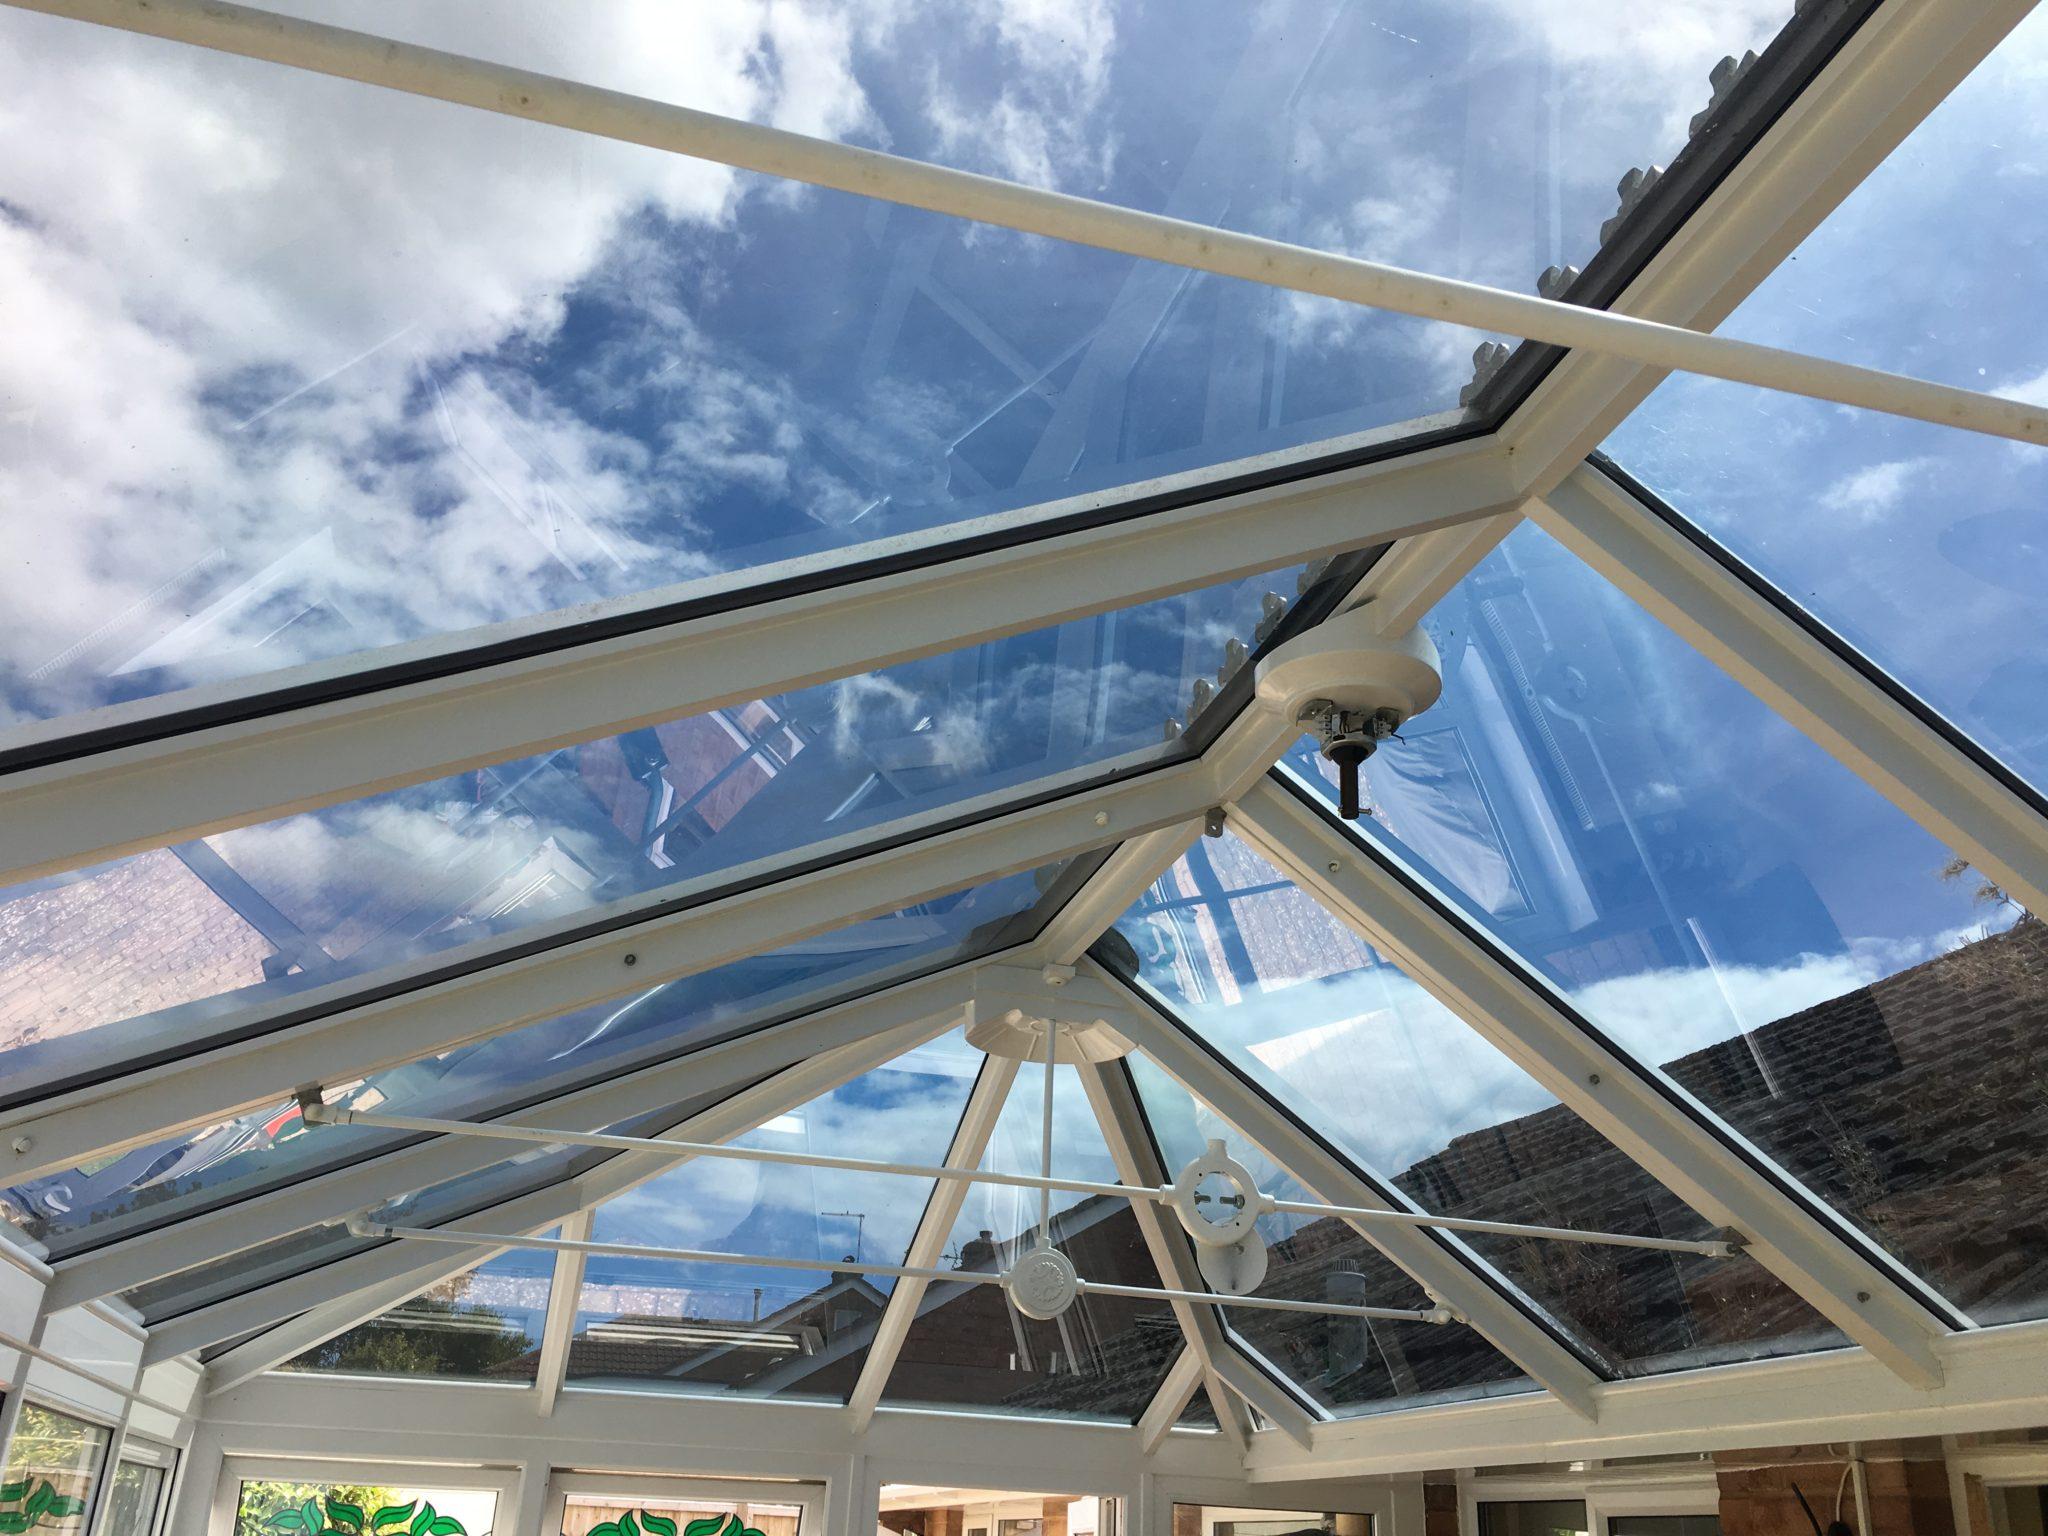 Conservatory Glare Reduction 11% Interior Reflectance